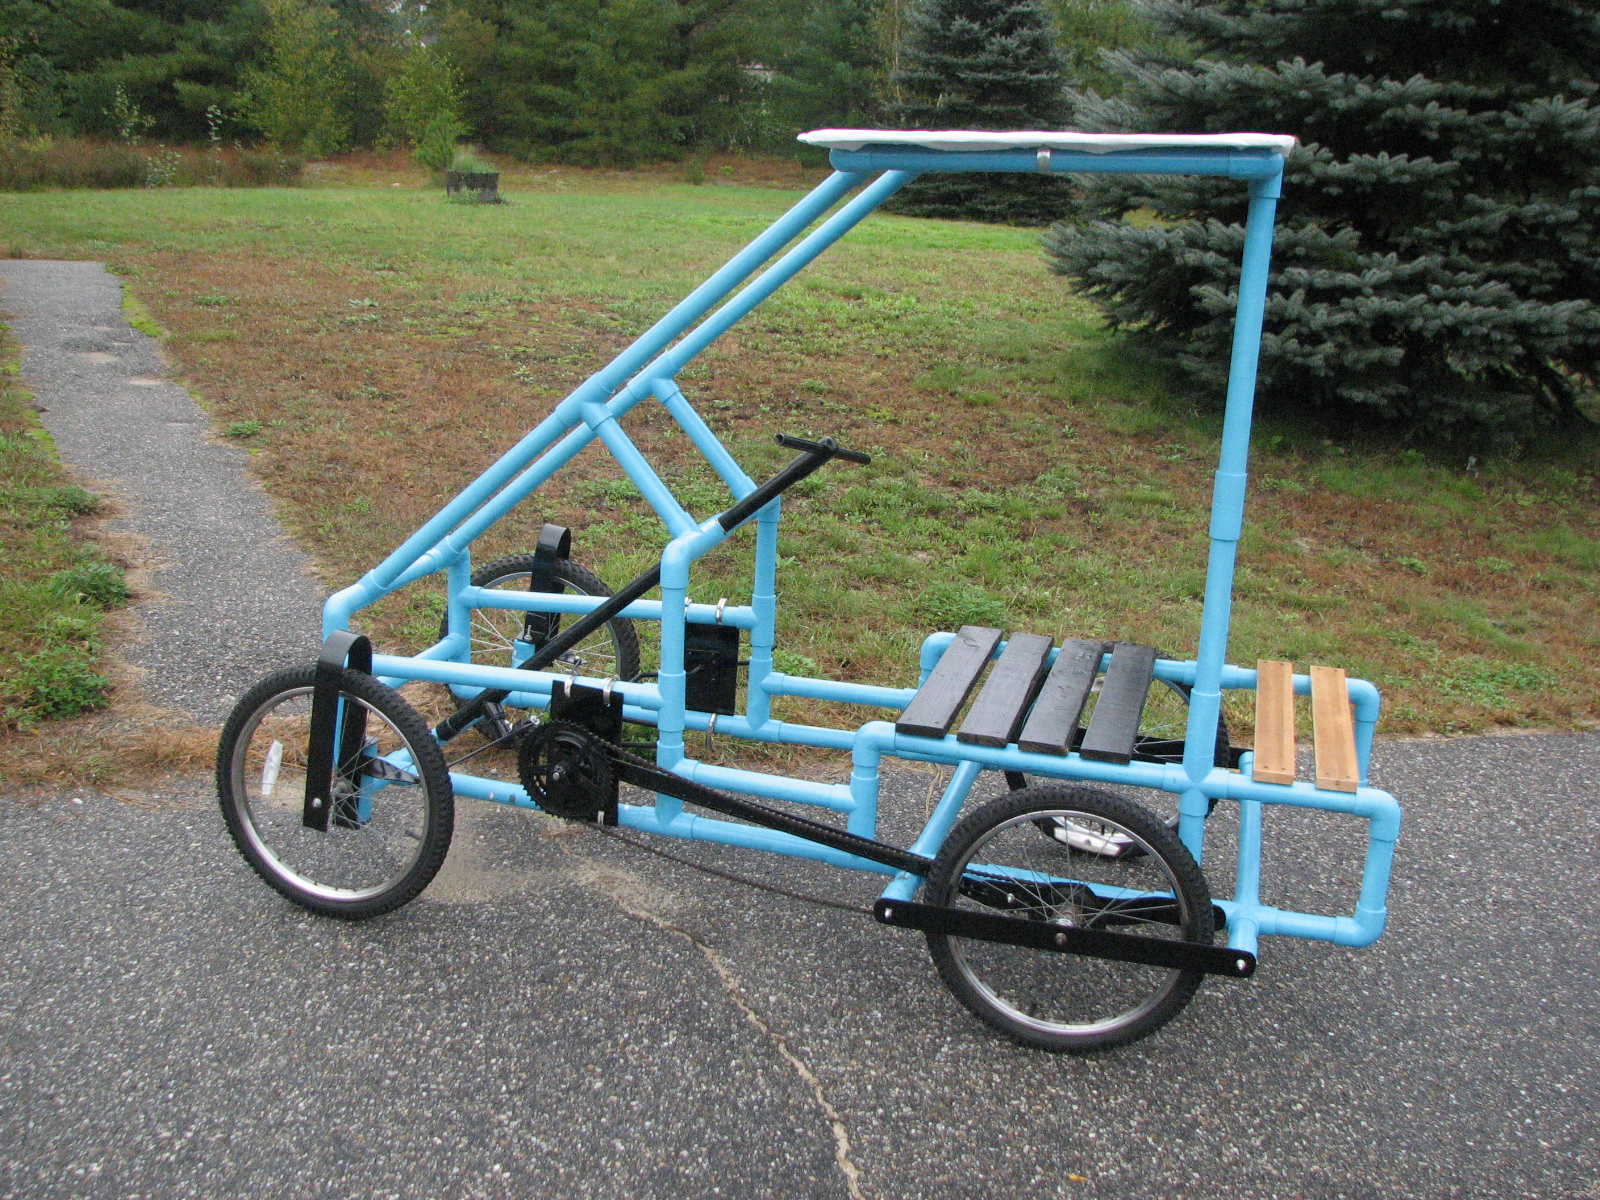 Pvc pedal car plans 1000 images about cycle ideas on for Pvc car